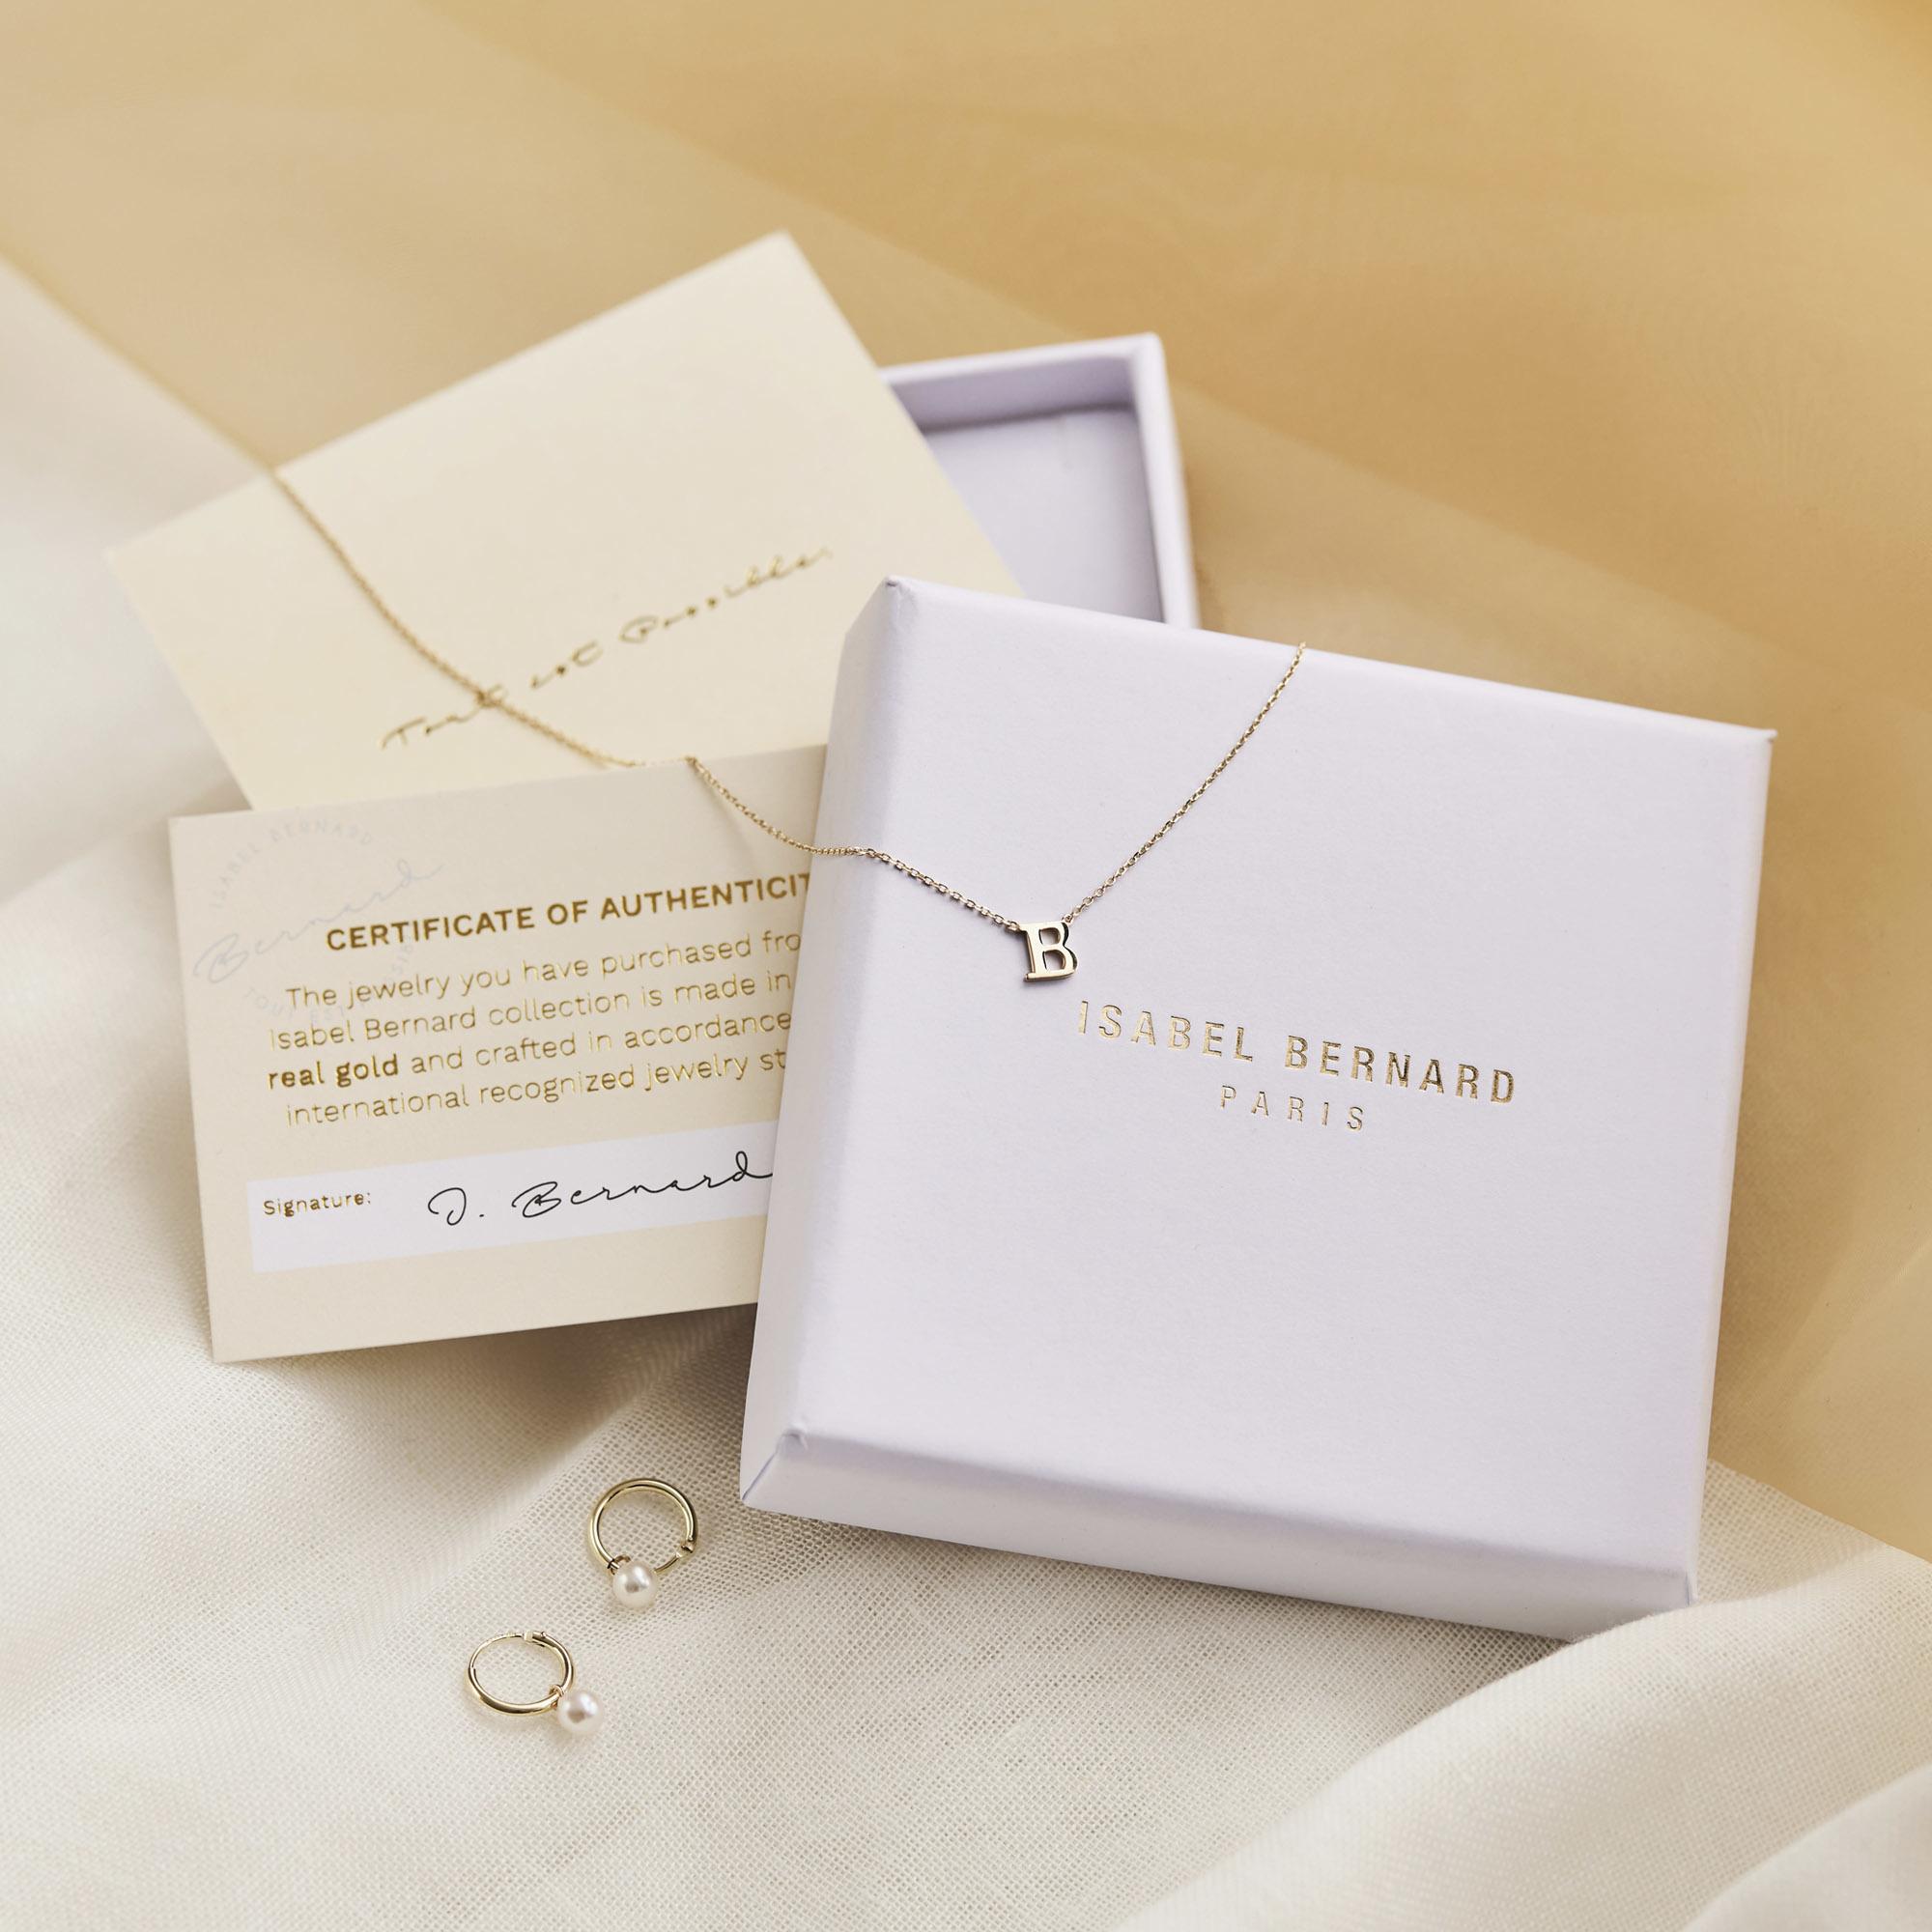 Isabel Bernard Saint Germain Rachel 14 karat white gold initial bracelet with letter